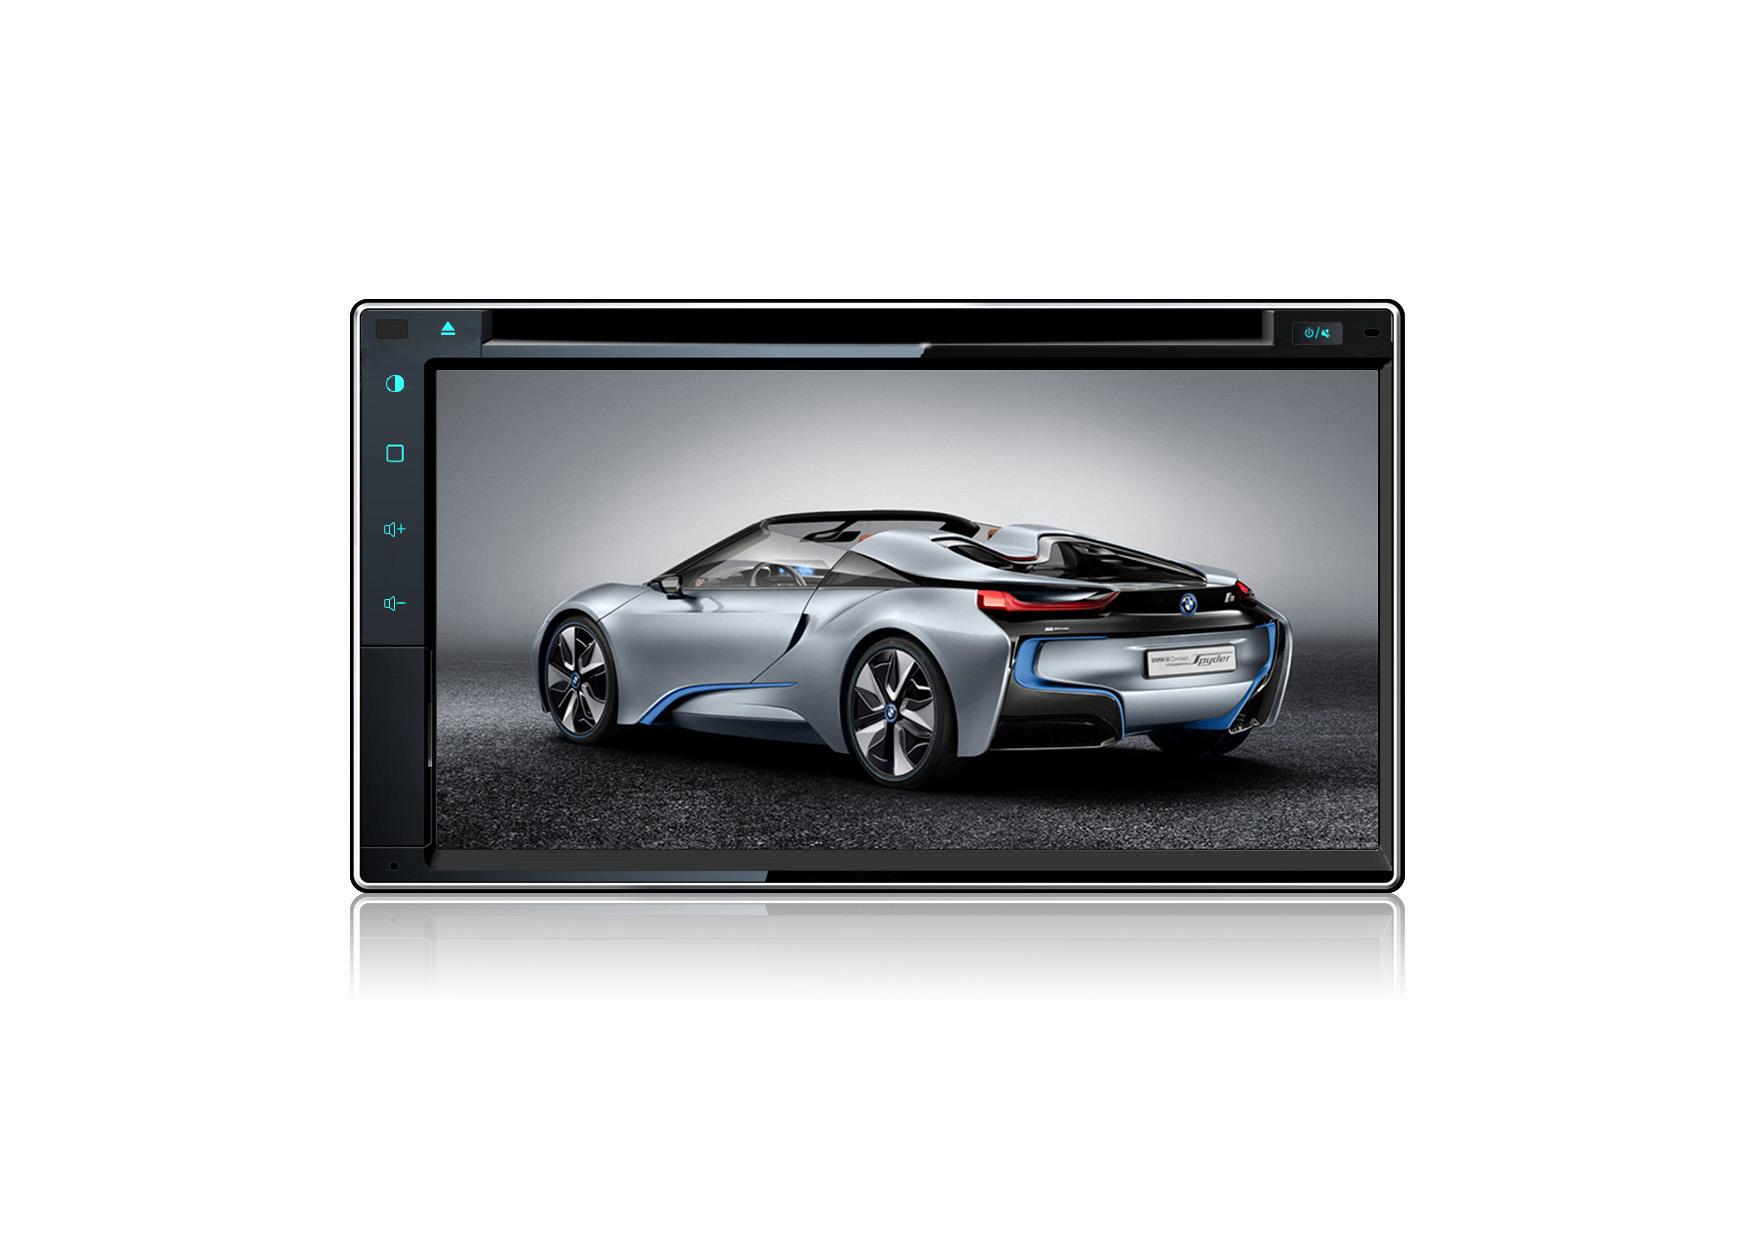 6.95-inch Toyota Universal Double Din DVD,car navigation/TV/BT/USB/SD/MP4/FM/AM